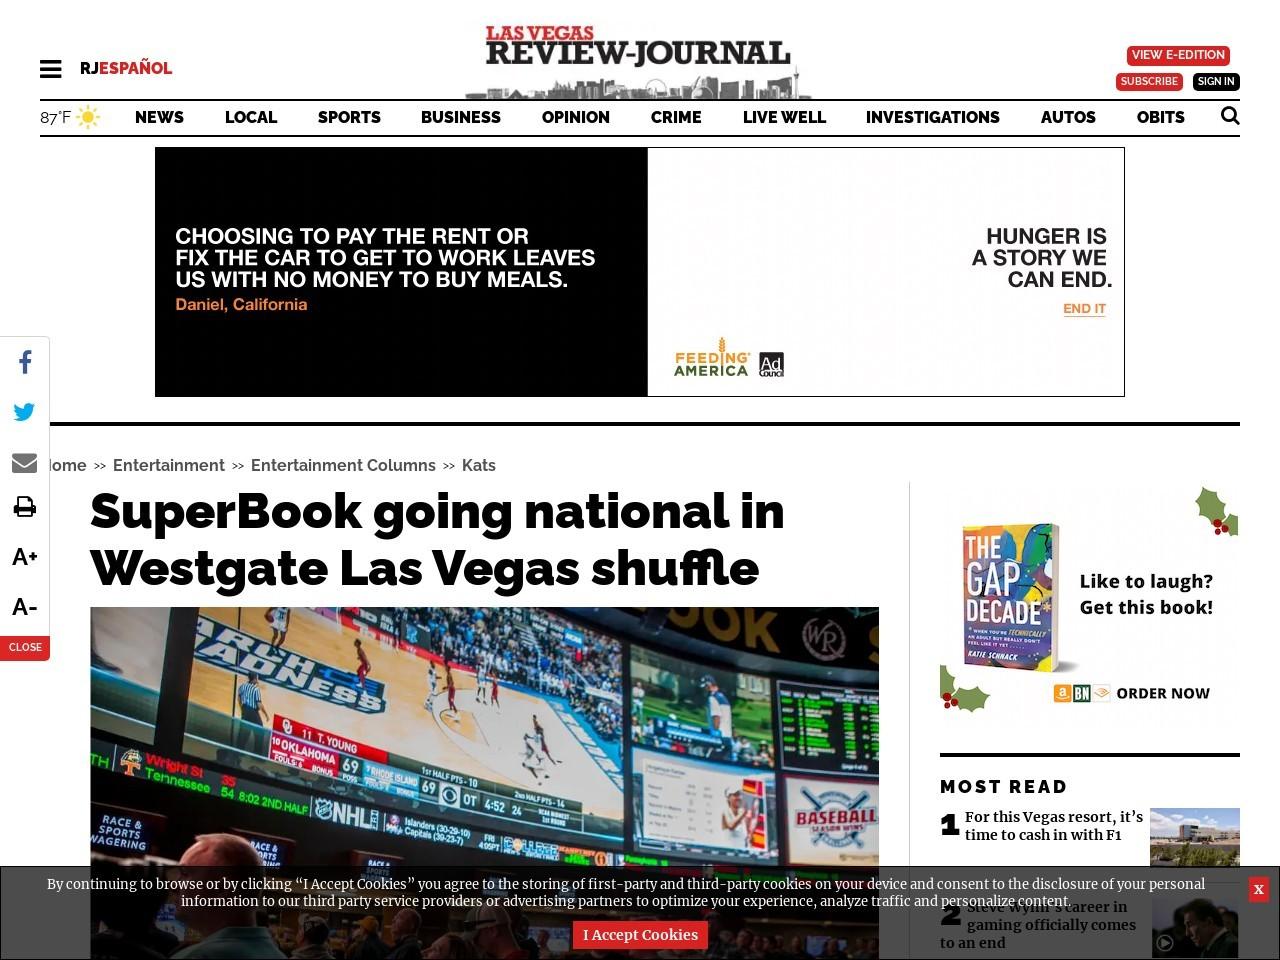 SuperBook going national in Westgate Las Vegas shuffle